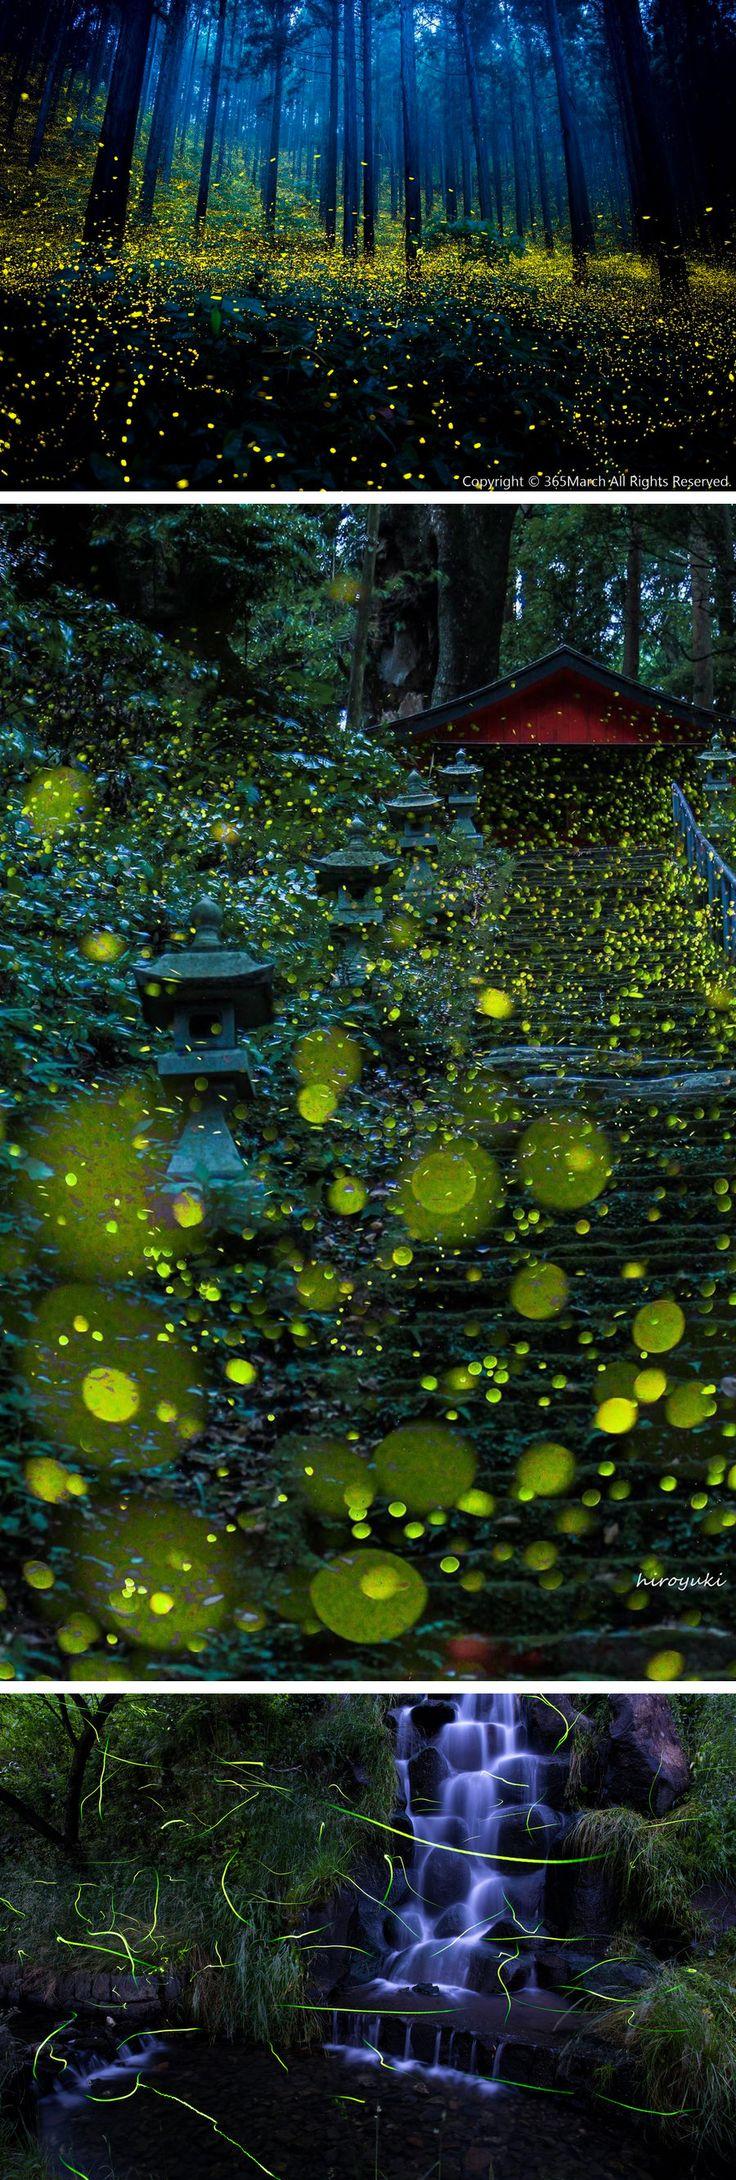 Magical Photographs of Fireflies from Japan's 2016 Summer